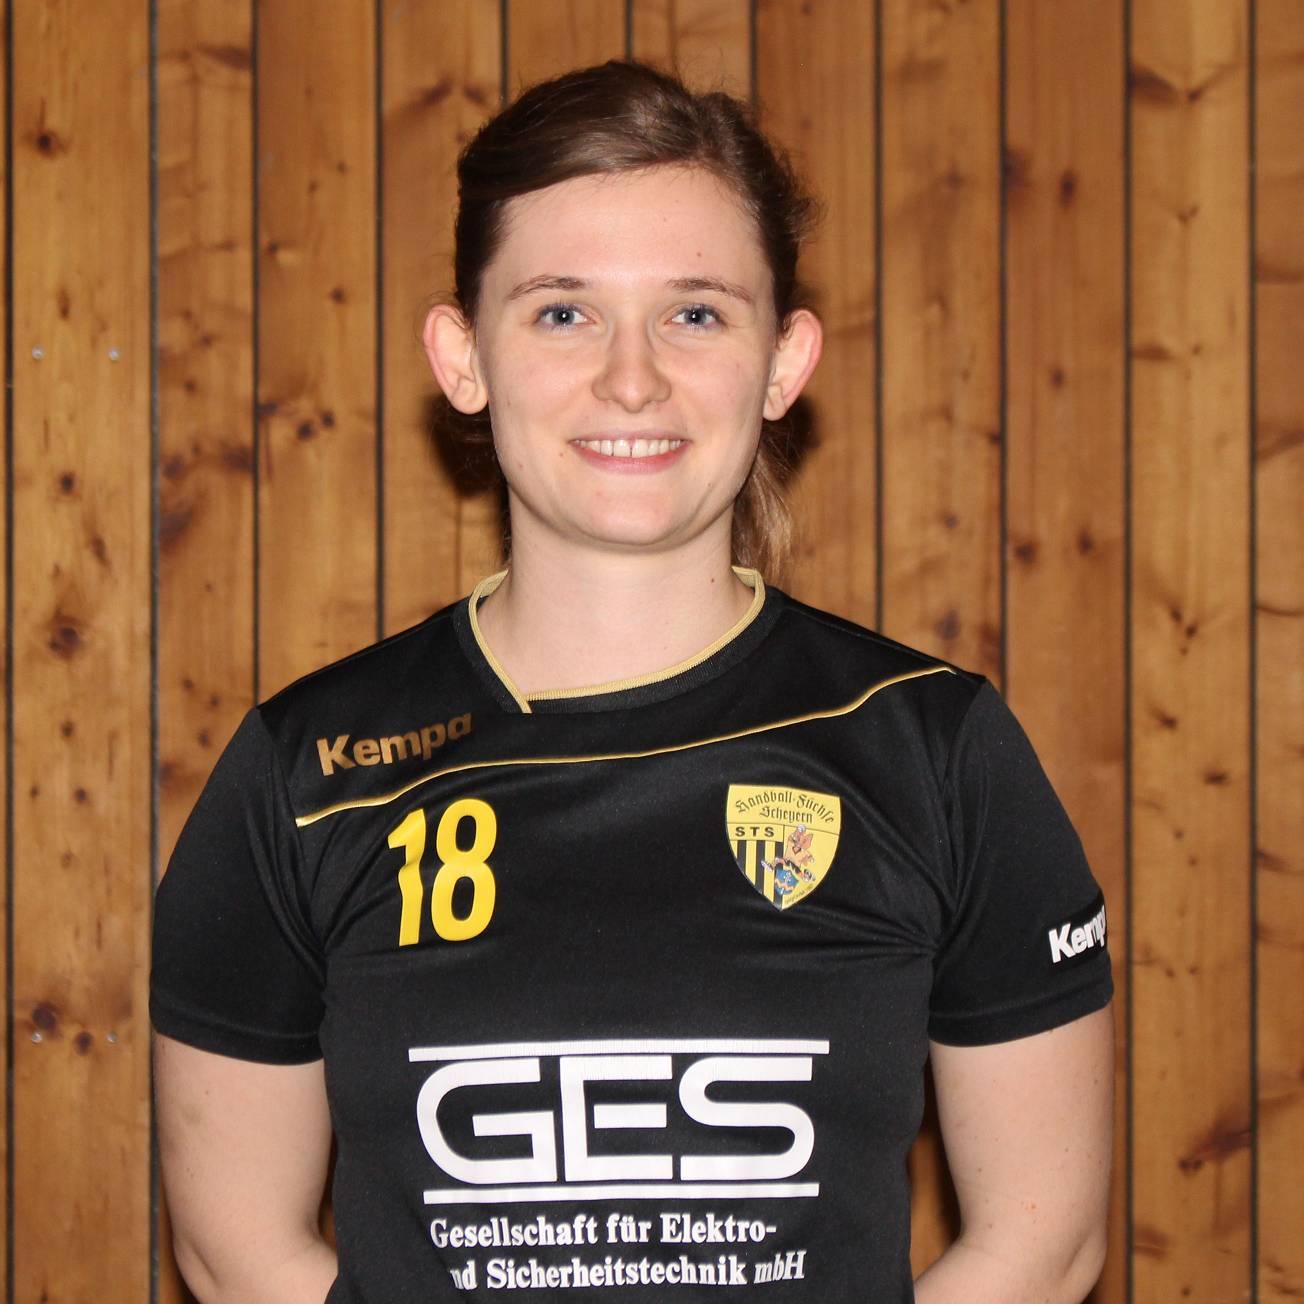 Elena Schenkel